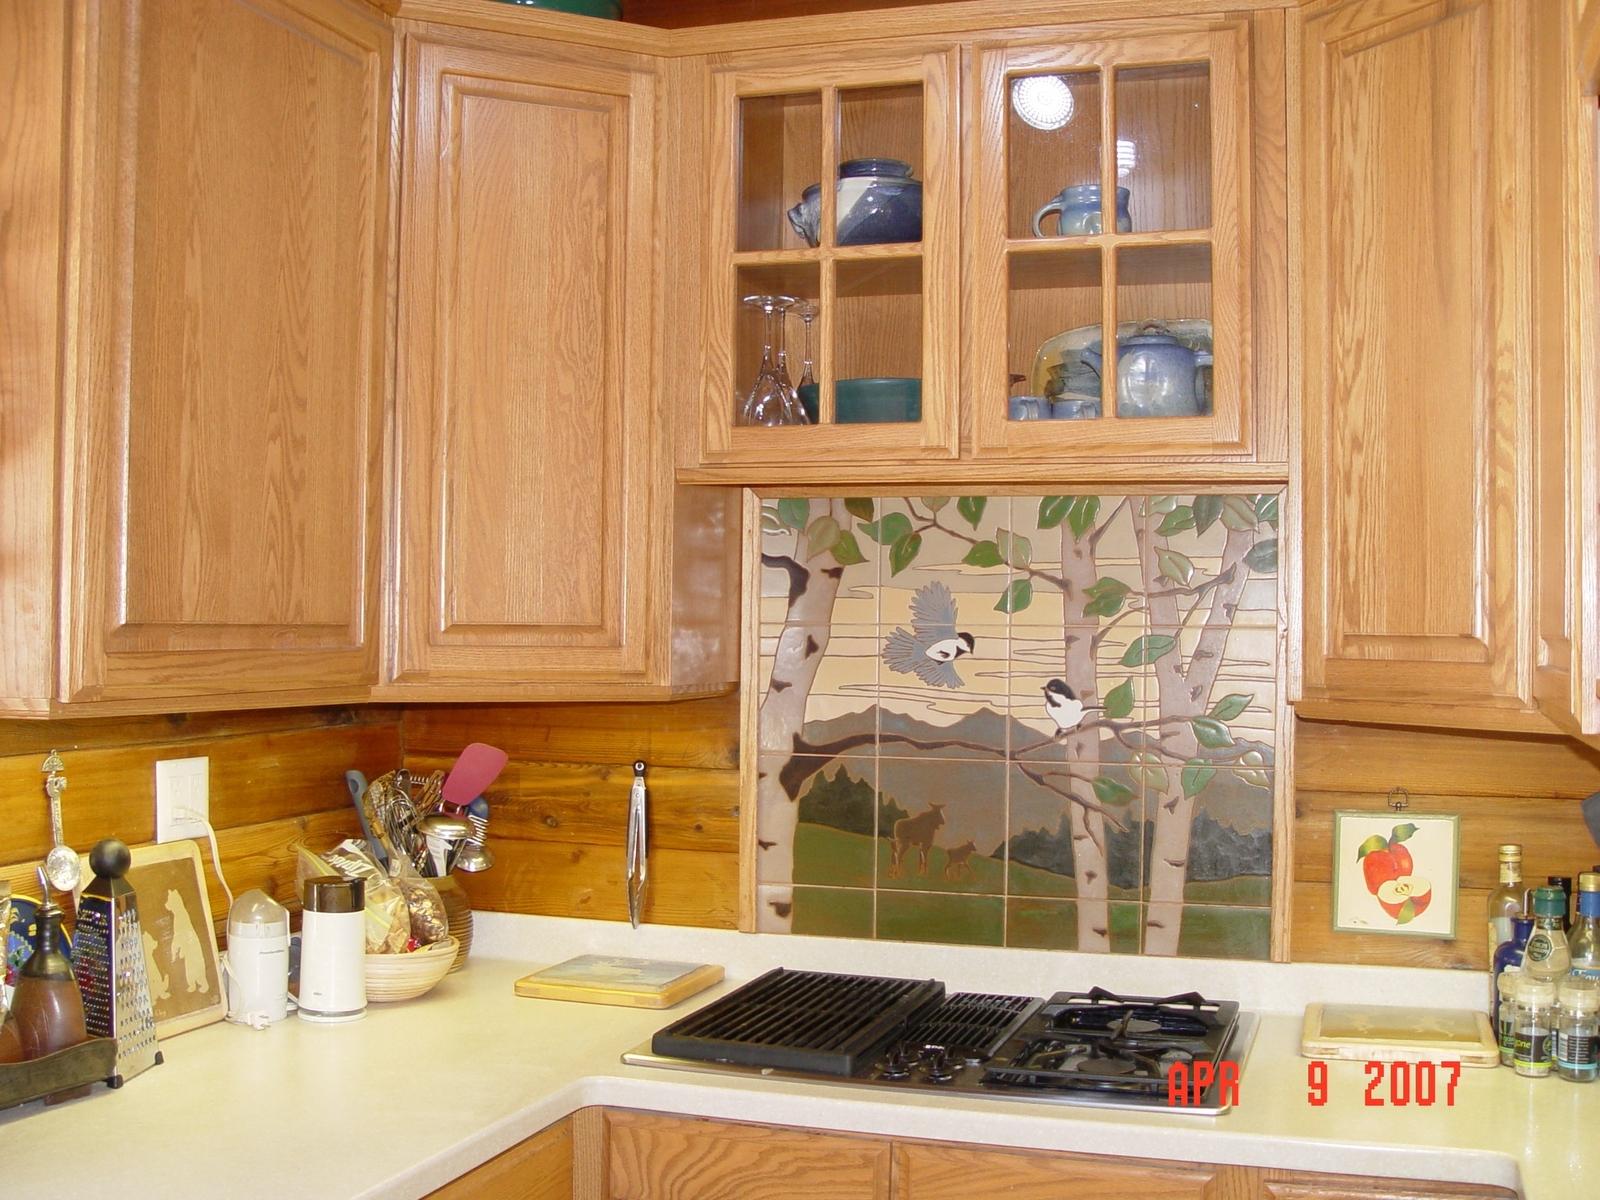 - Free Download Wallpapercomphotokitchen Wallpaper Backsplash